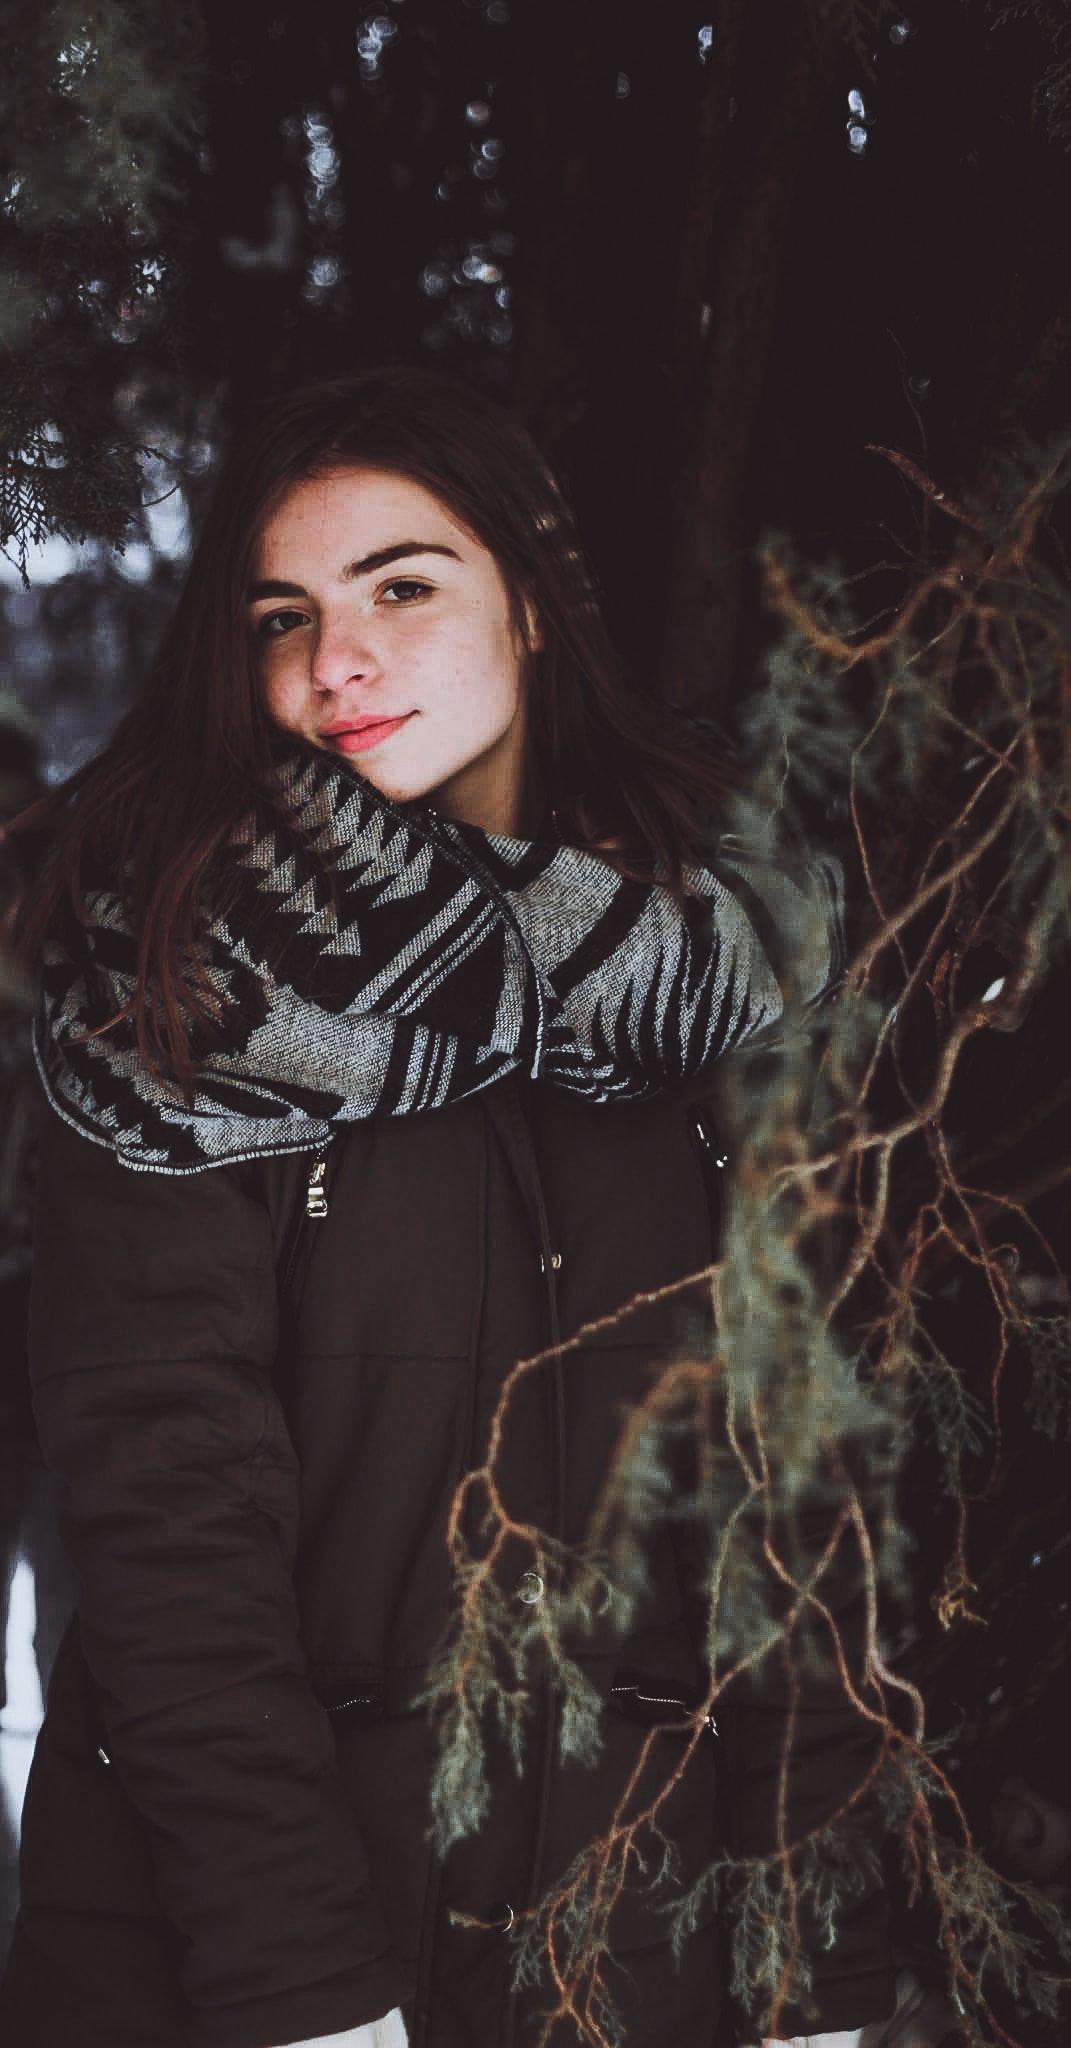 Woman wearing black zip-up jacket posing under tree photo